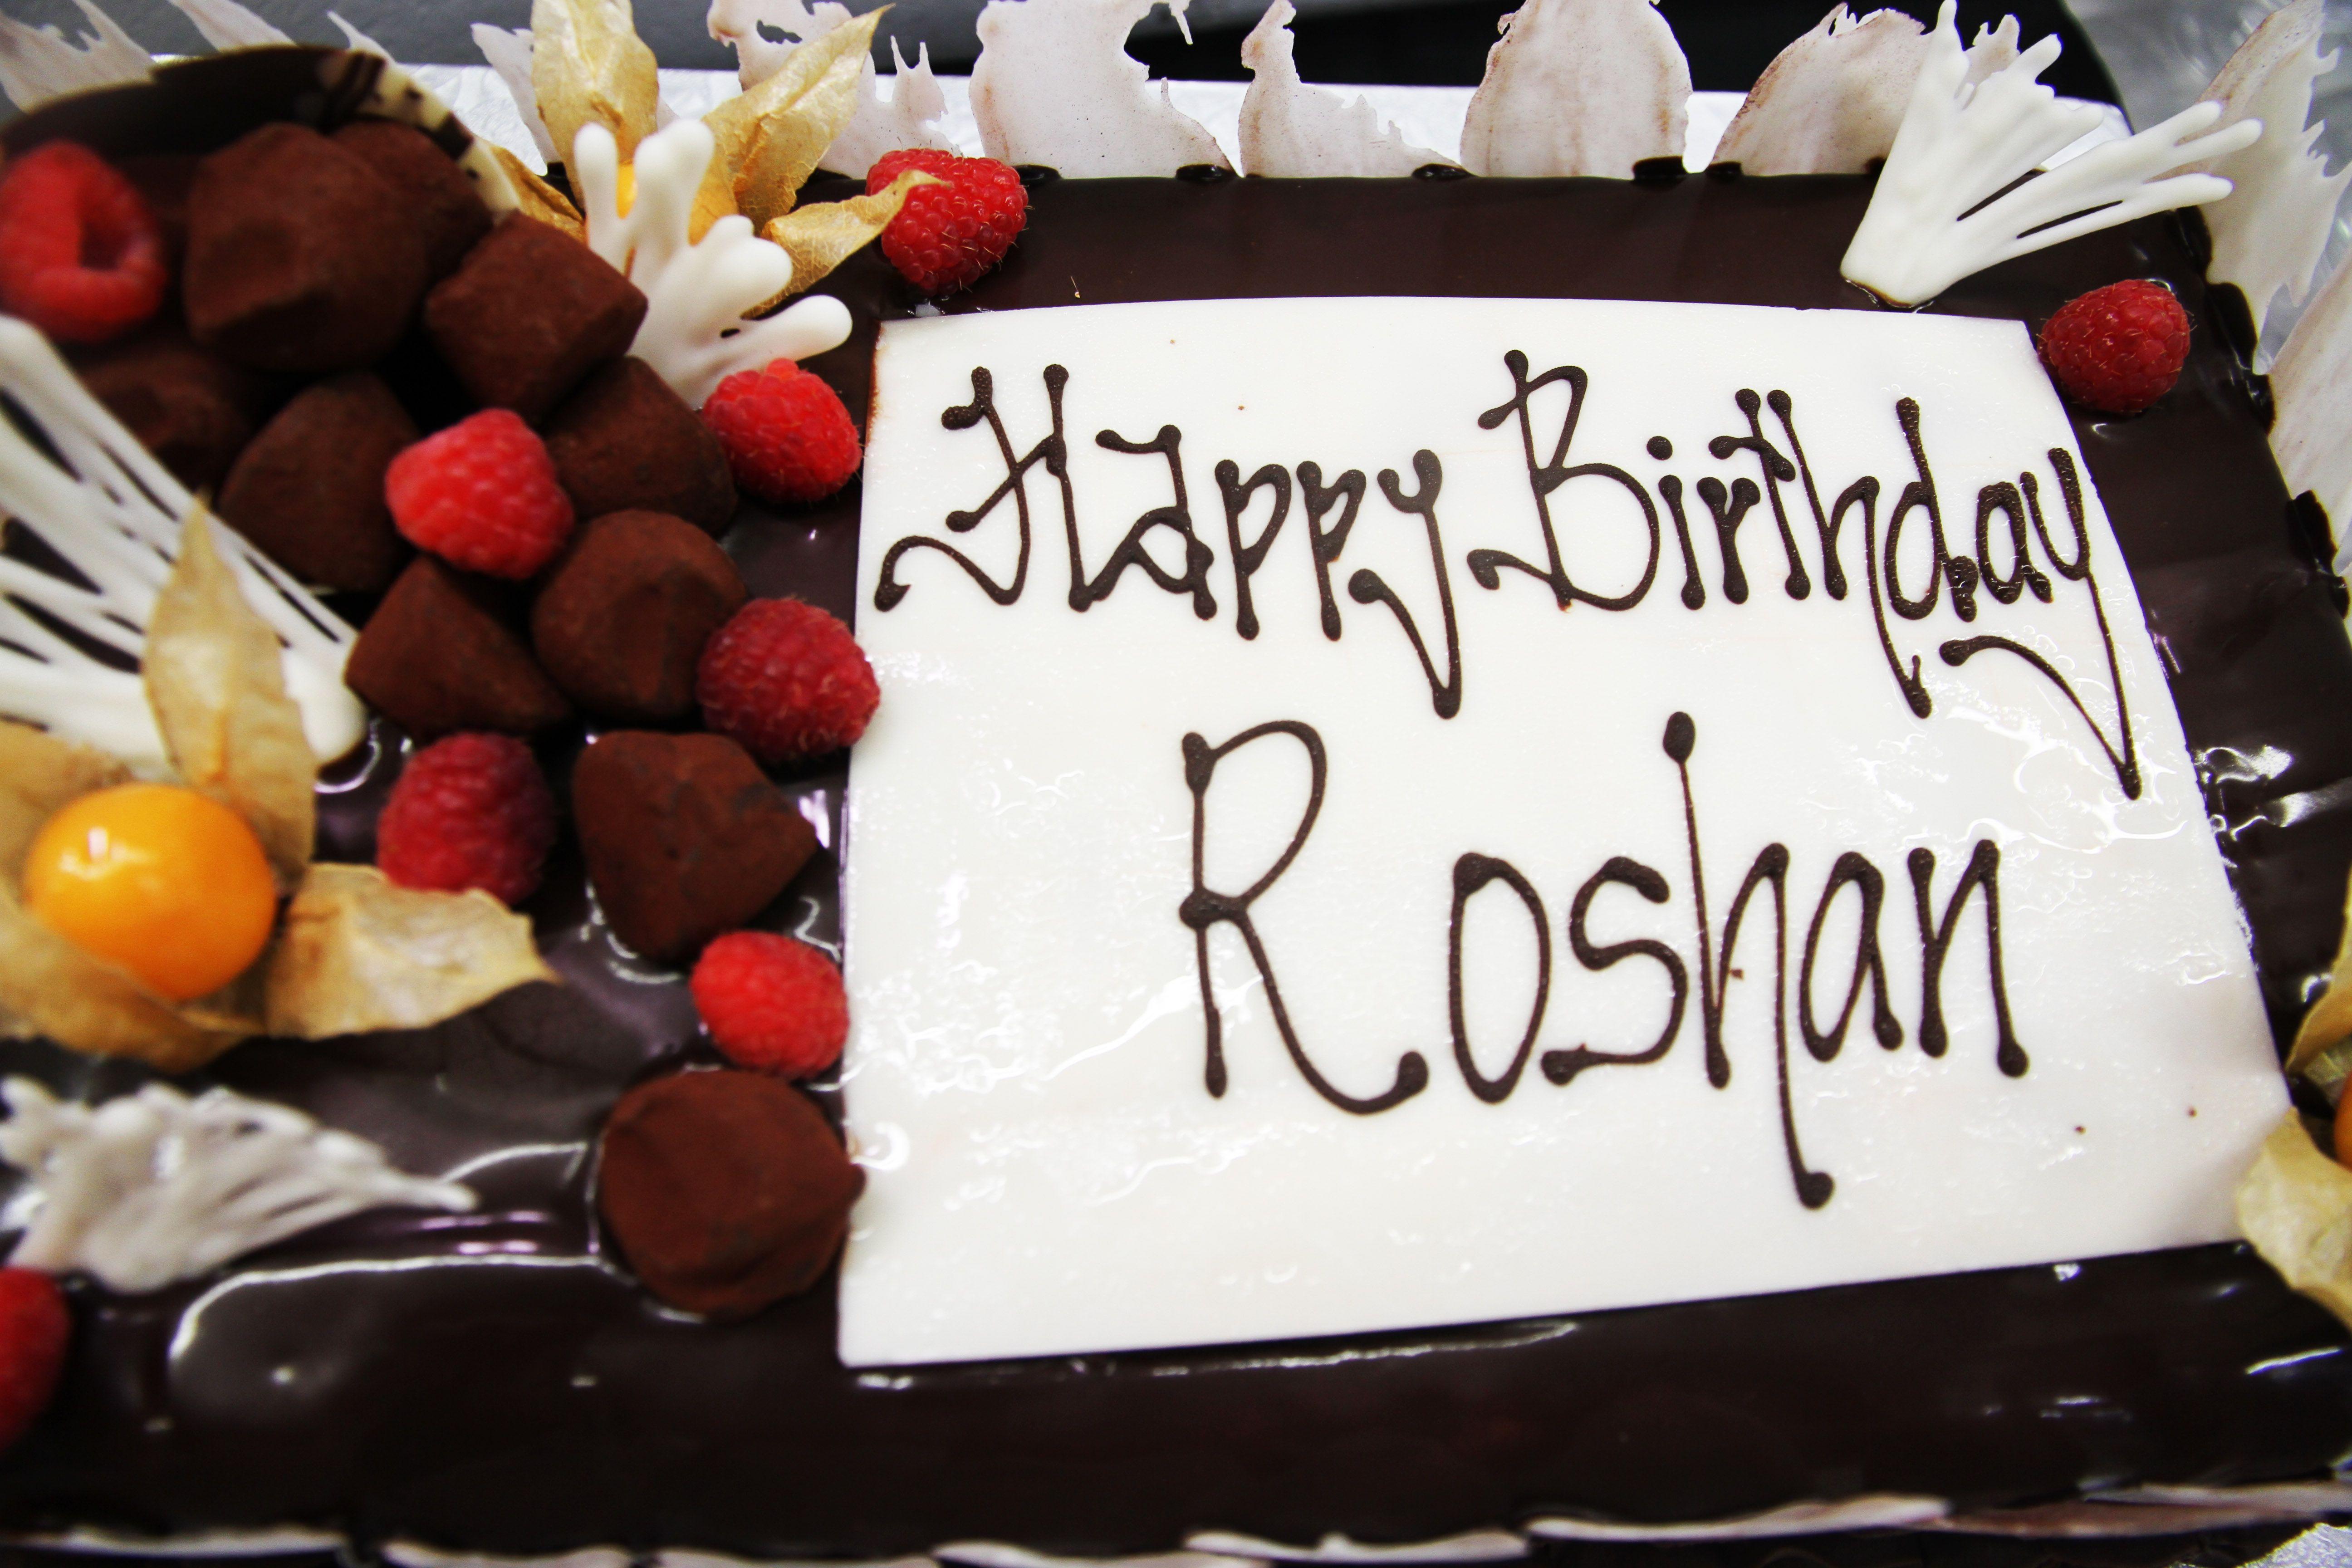 Pin By Maisha Jahan Jahan On My Saves In 2021 Beautiful Birthday Cakes Food Snapchat Cake Story